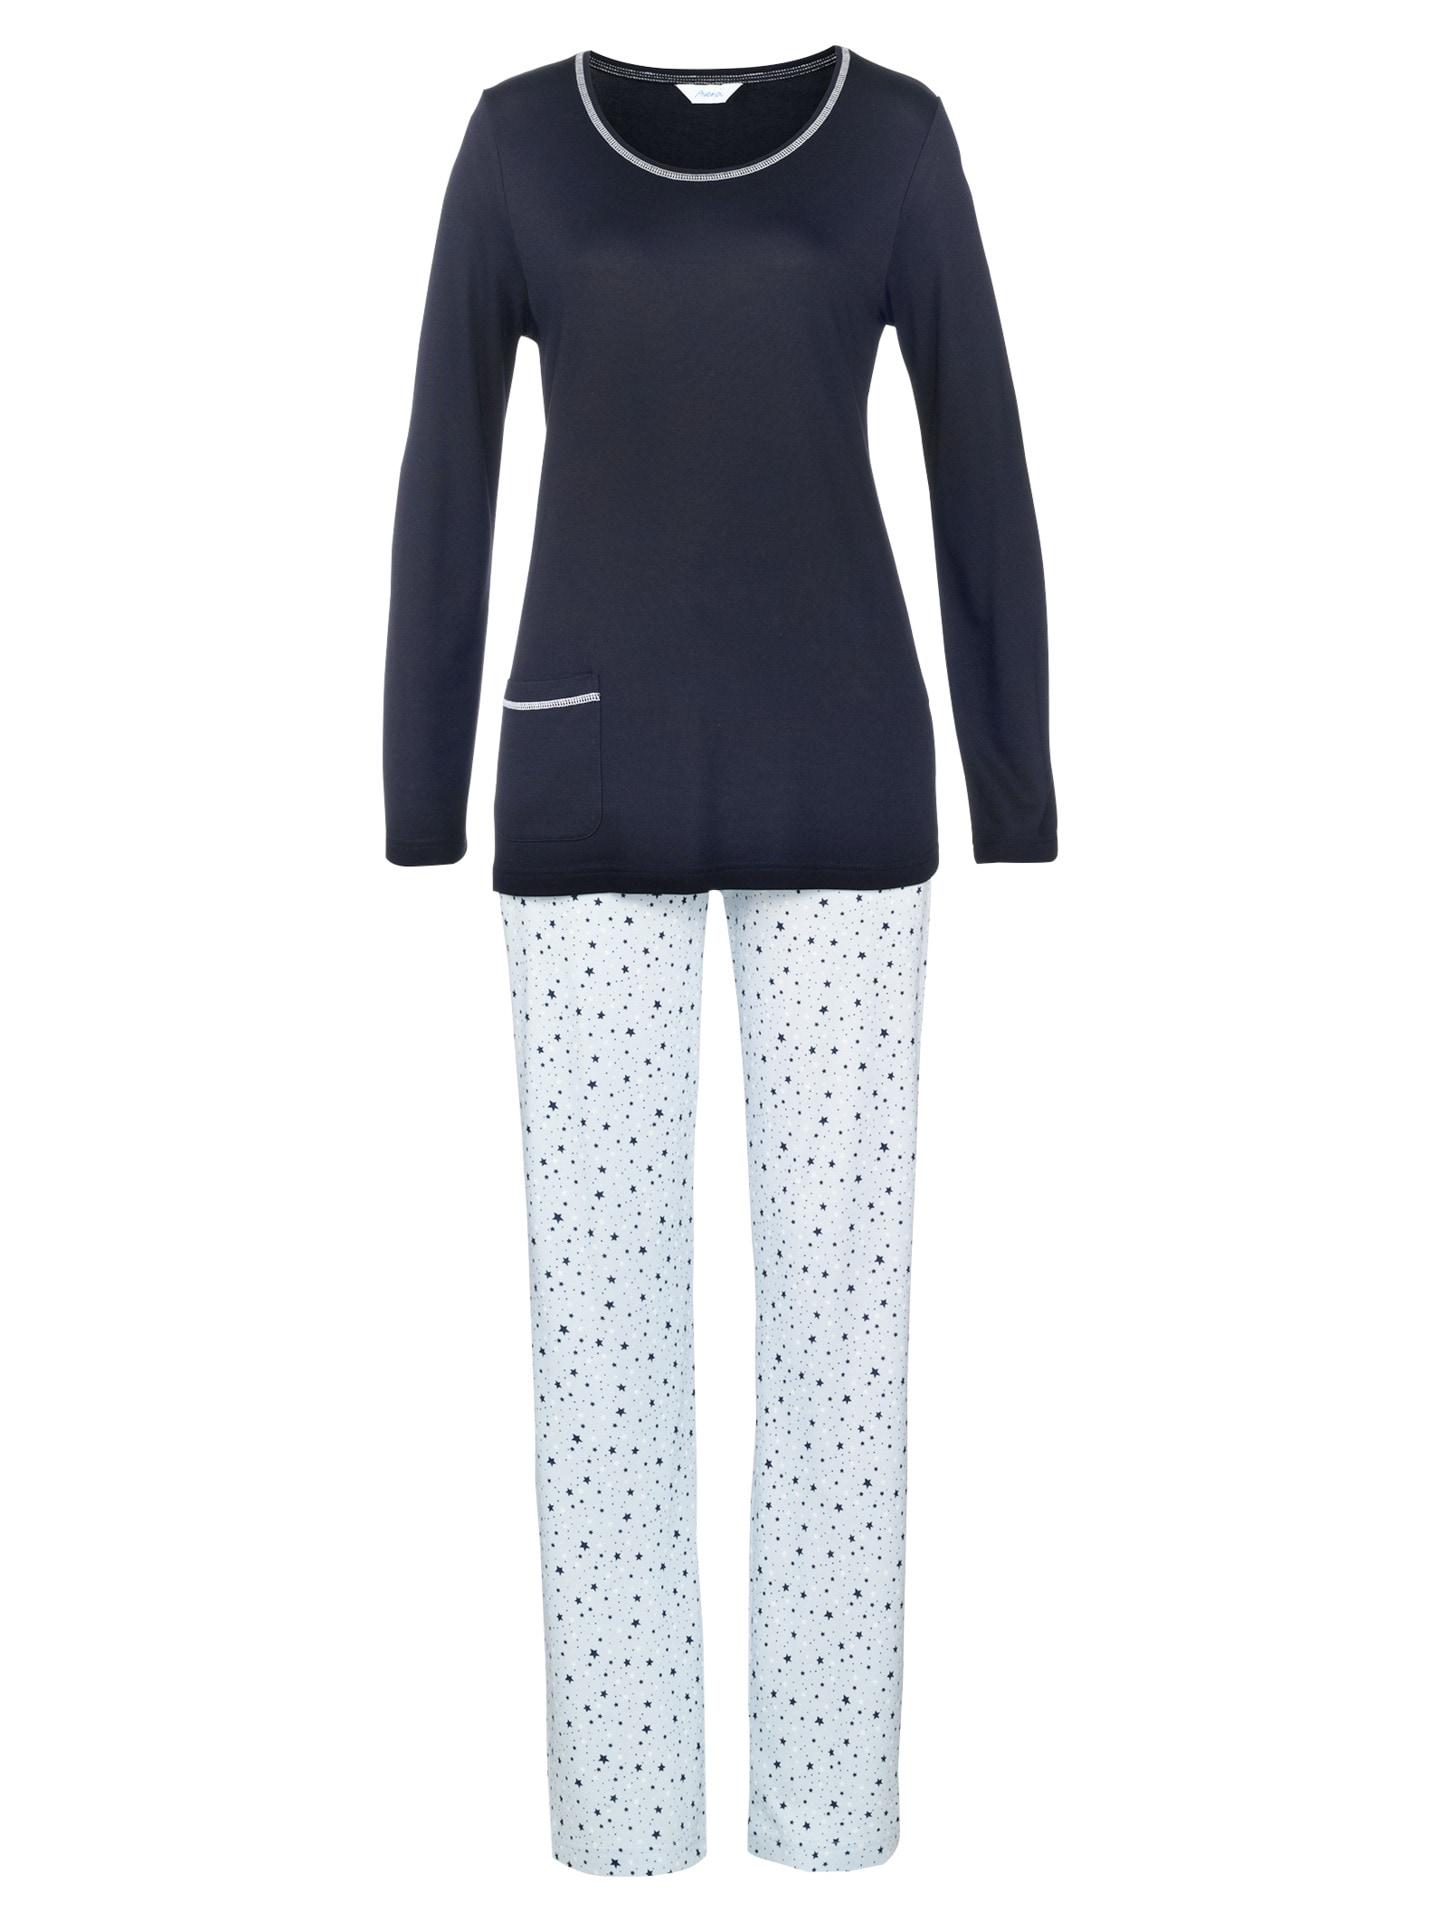 Avena Damen Pyjama Hellblau gemustert 42-6175-5_MV8880